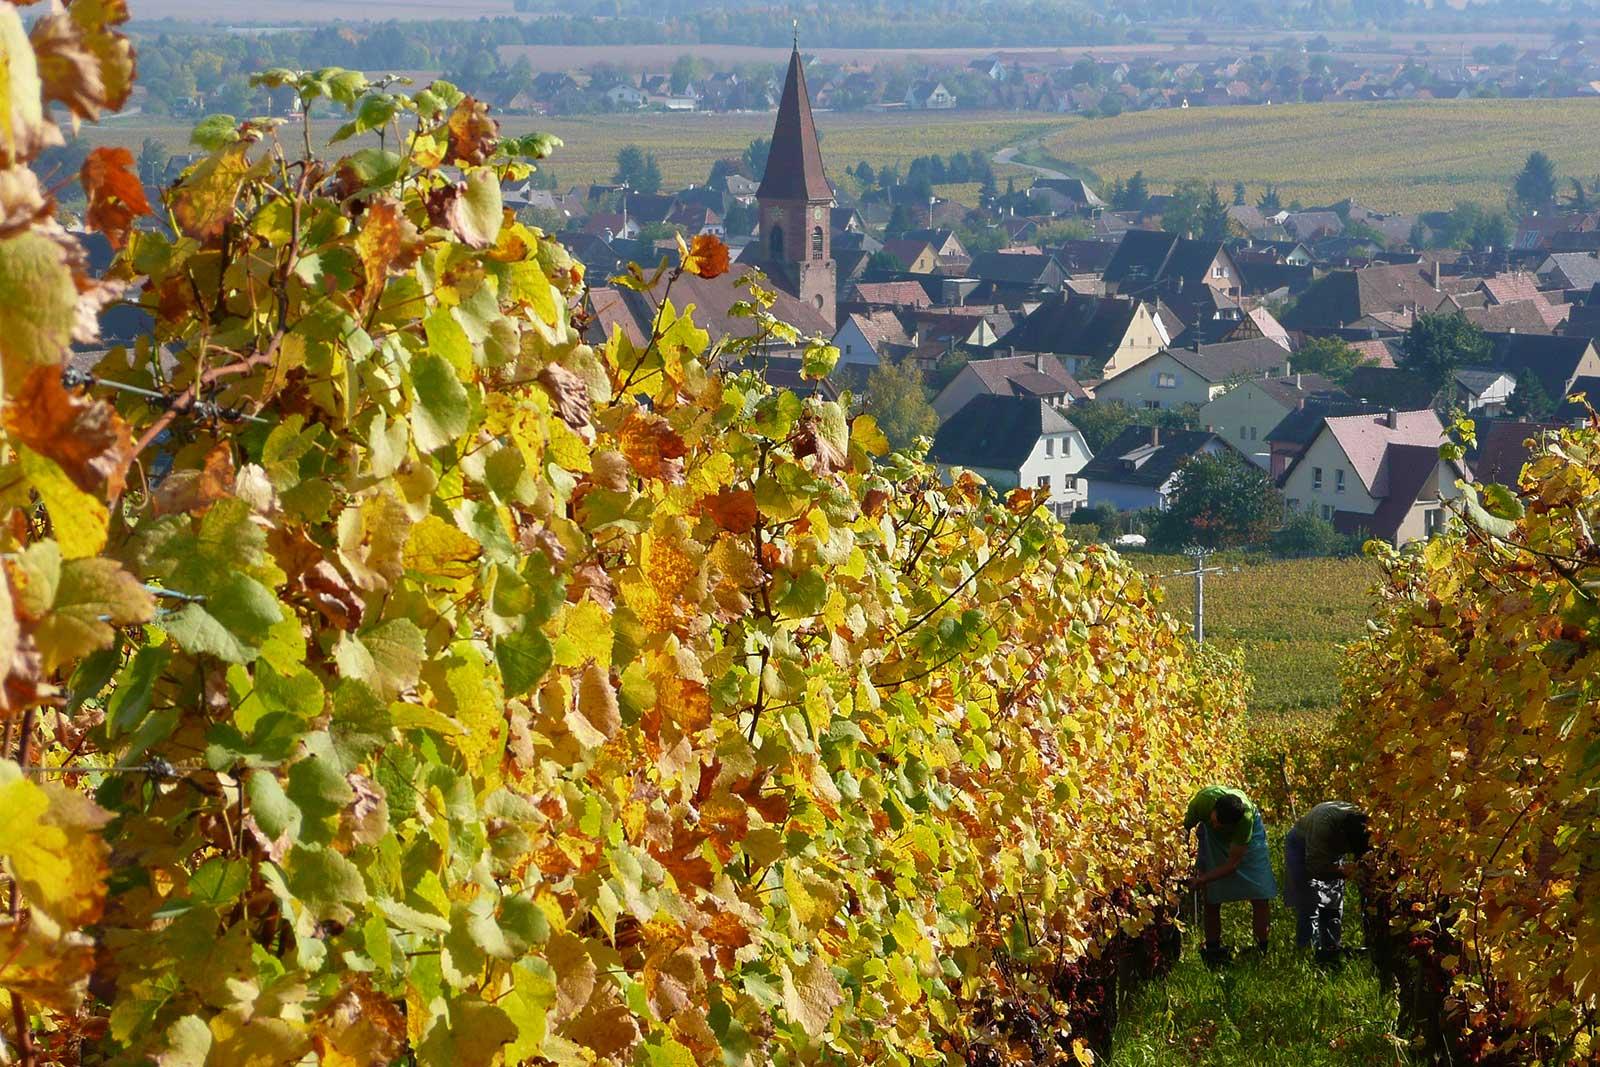 A view of Wettolsheim as harvest gets underway in the Grand Cru Hengst. ©Barmès-Buecher